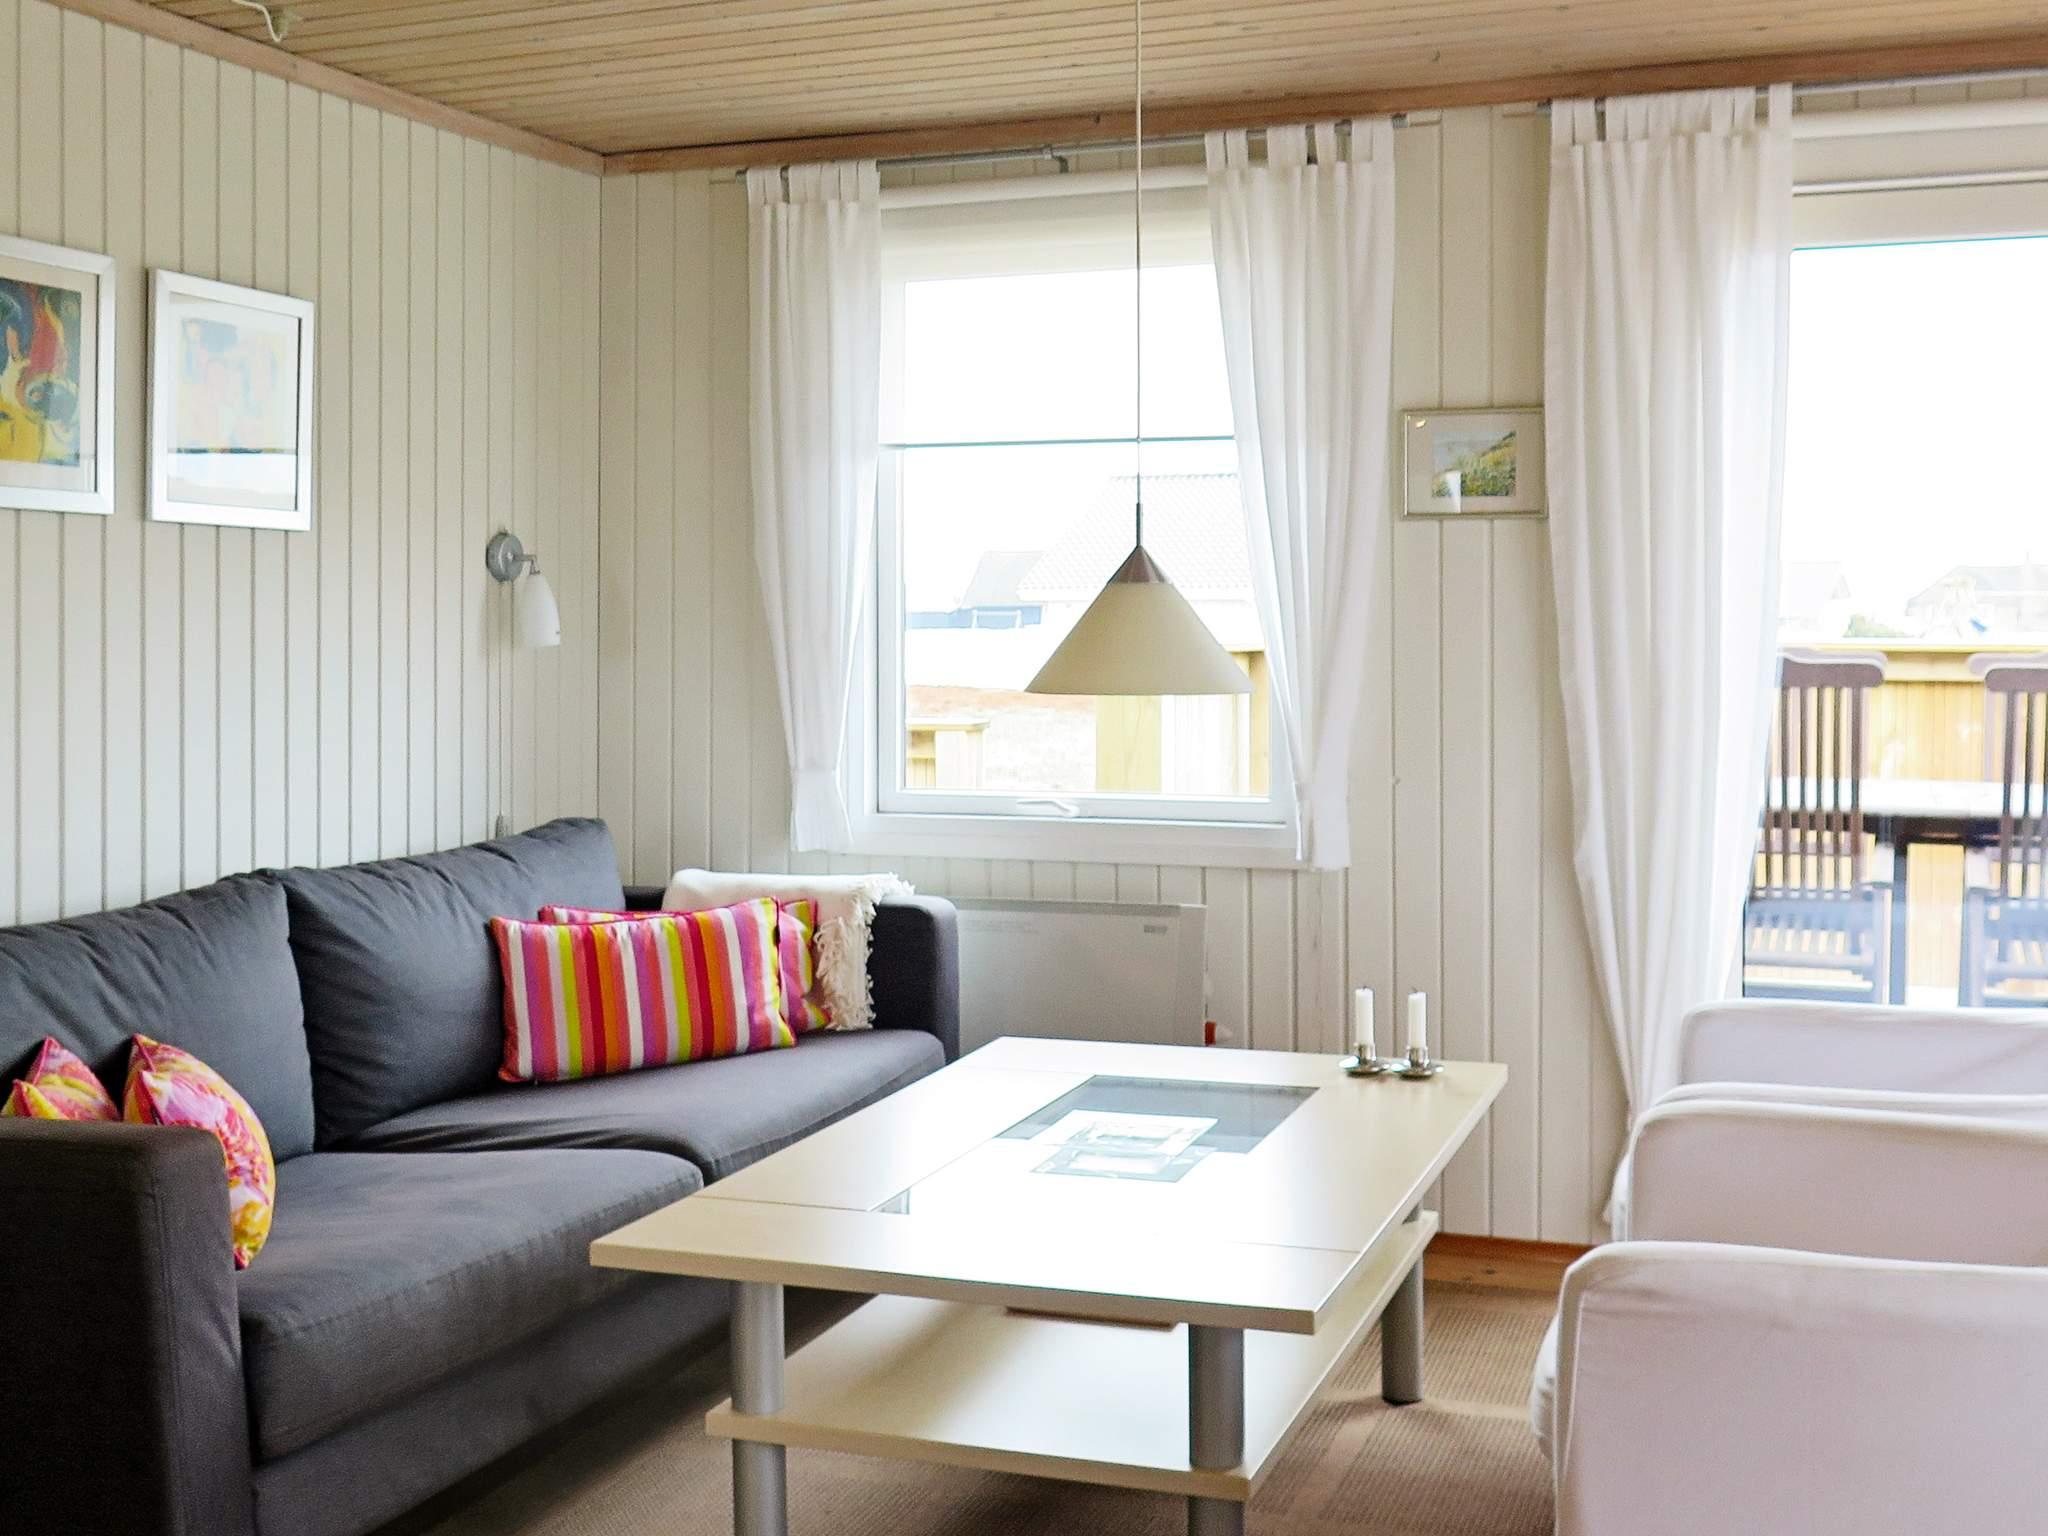 Ferienhaus Vrist (293960), Vrist, , Limfjord, Dänemark, Bild 2